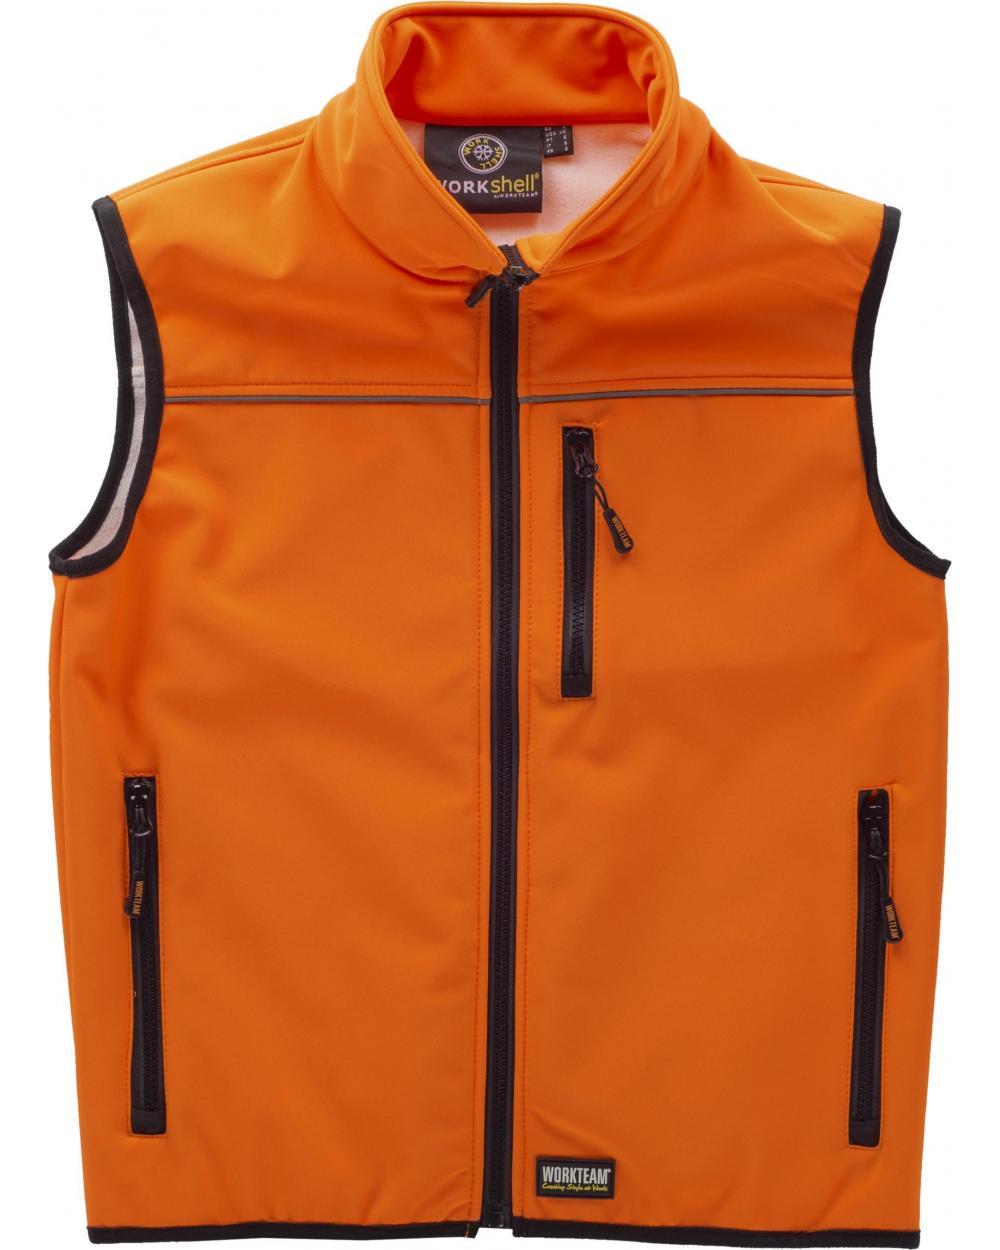 Comprar Chaleco Workshell alta visibilidad (Gorra A.V. de regalo) Naranja A.V. online bataro delante